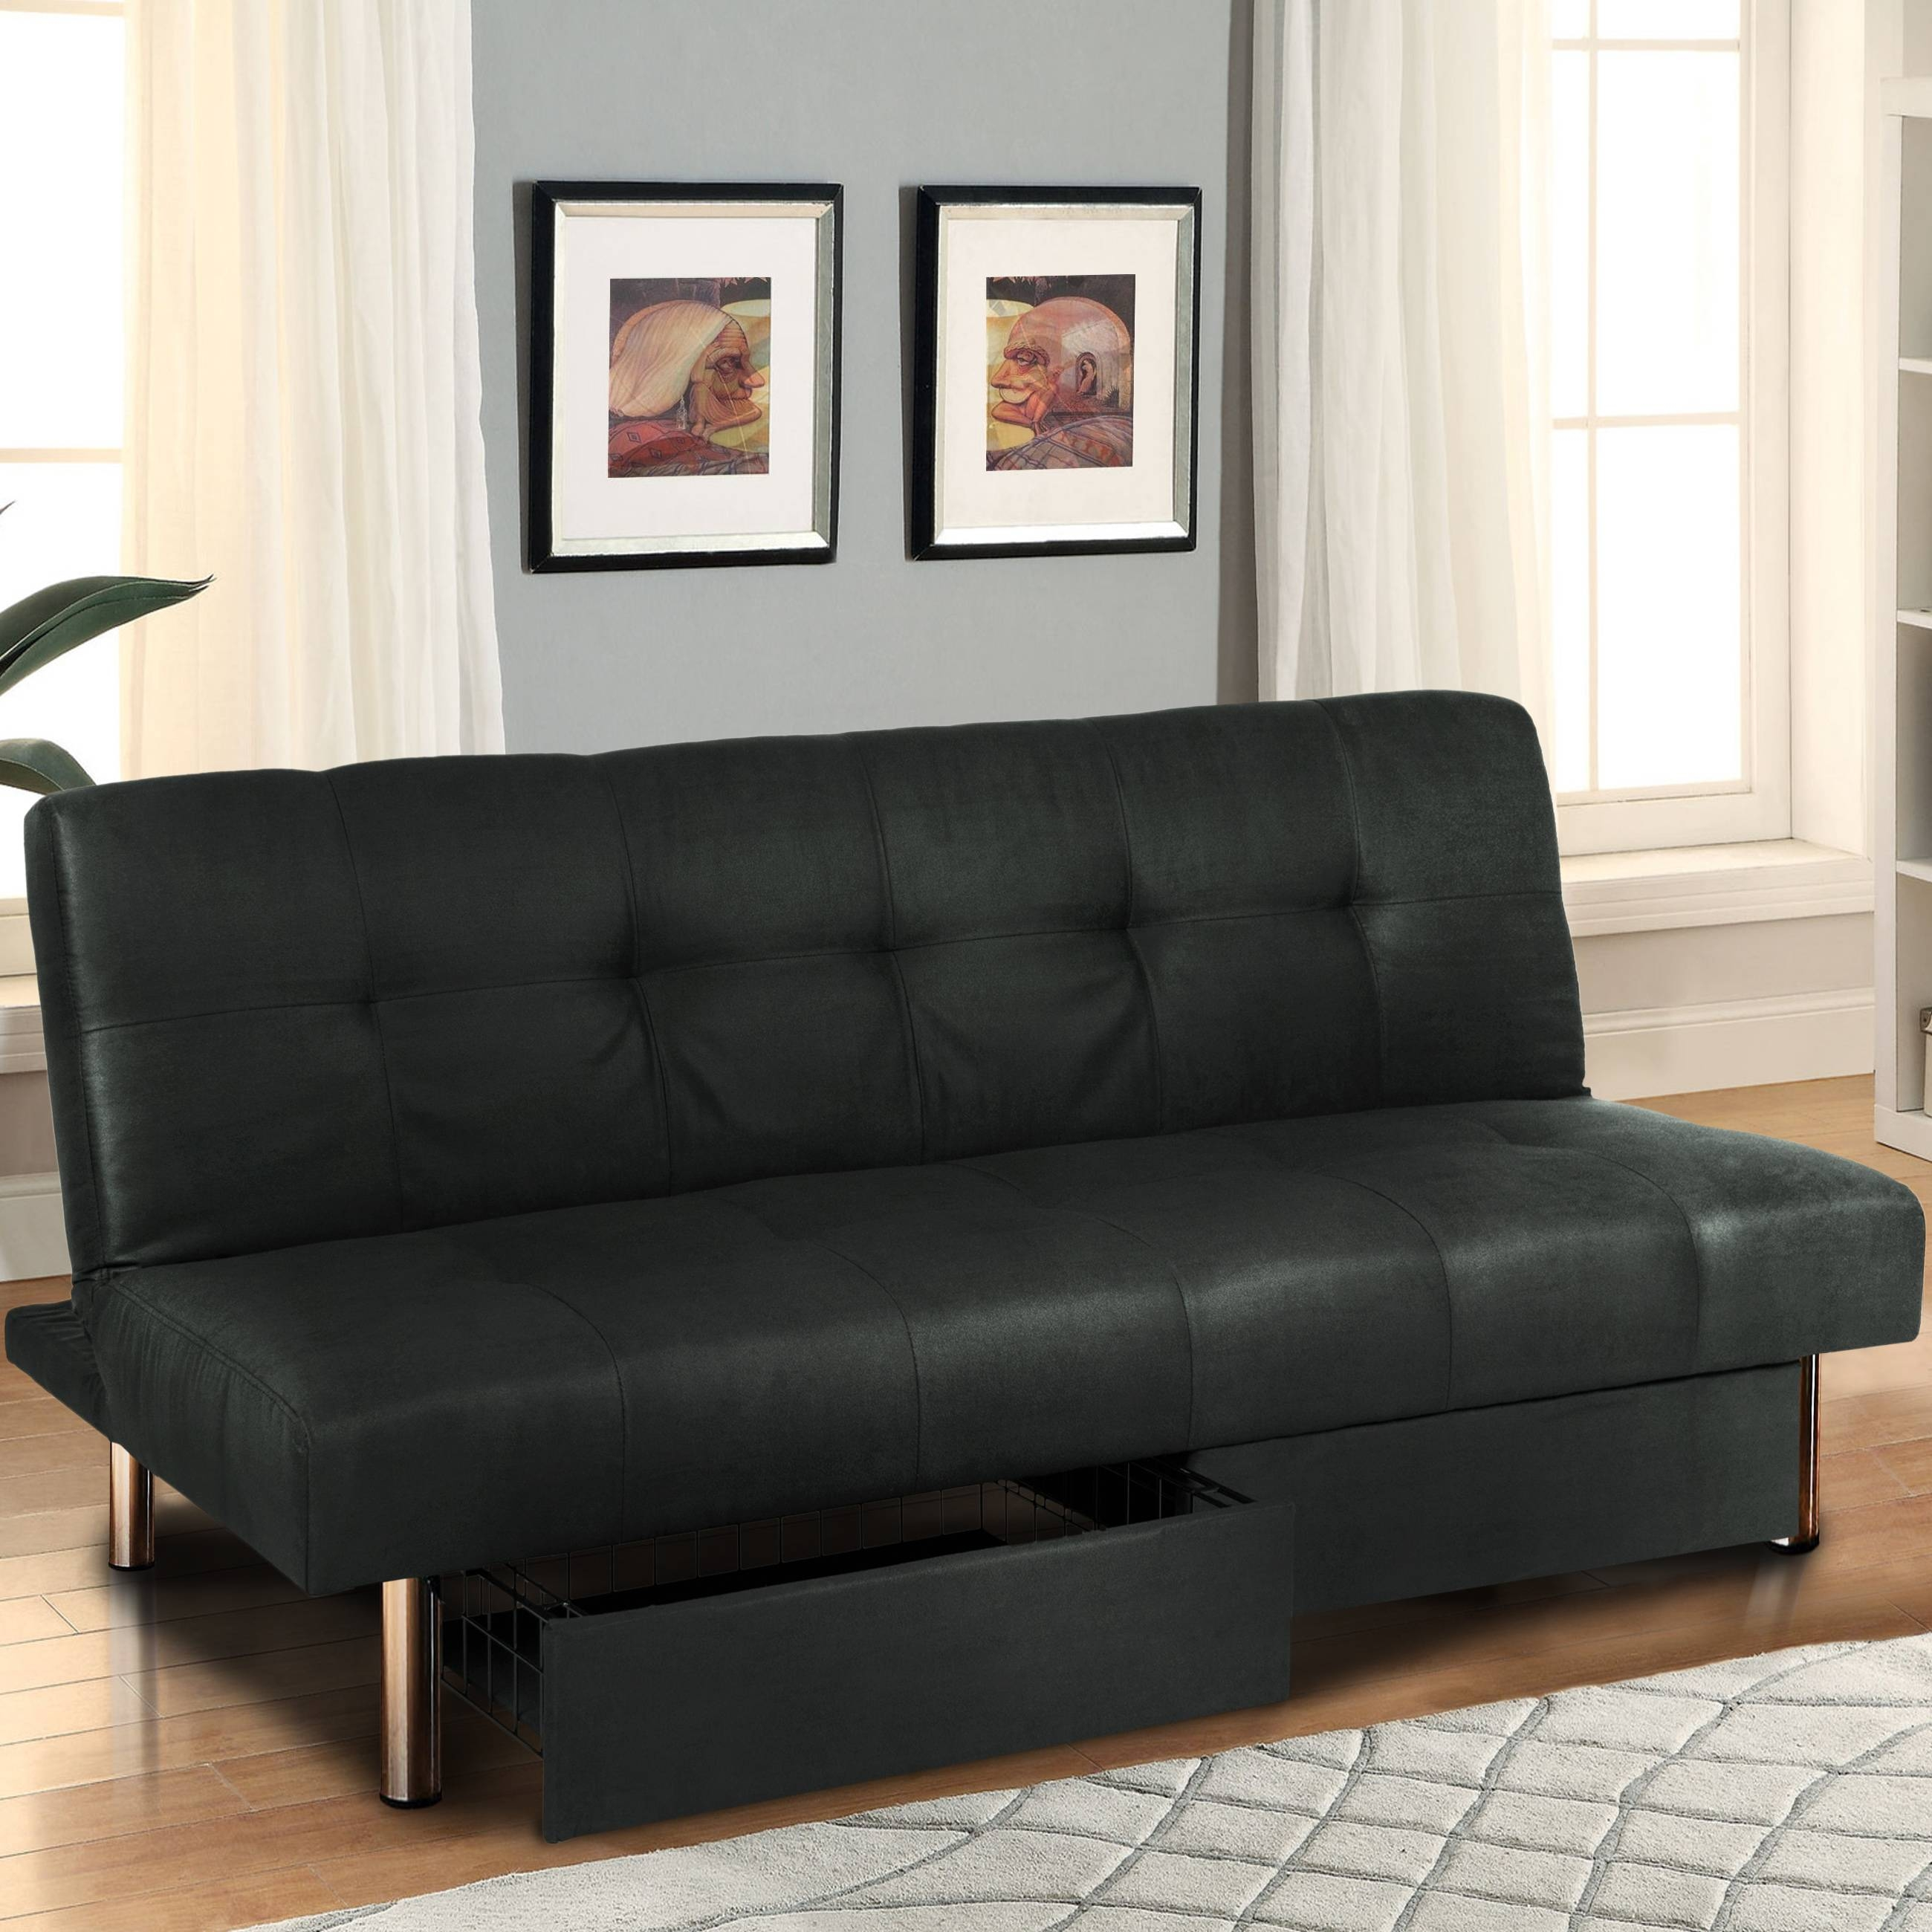 Microfiber Futon Folding Sofa Bed Couch Mattress & Storage pertaining to Leather Fouton Sofas (Image 11 of 15)